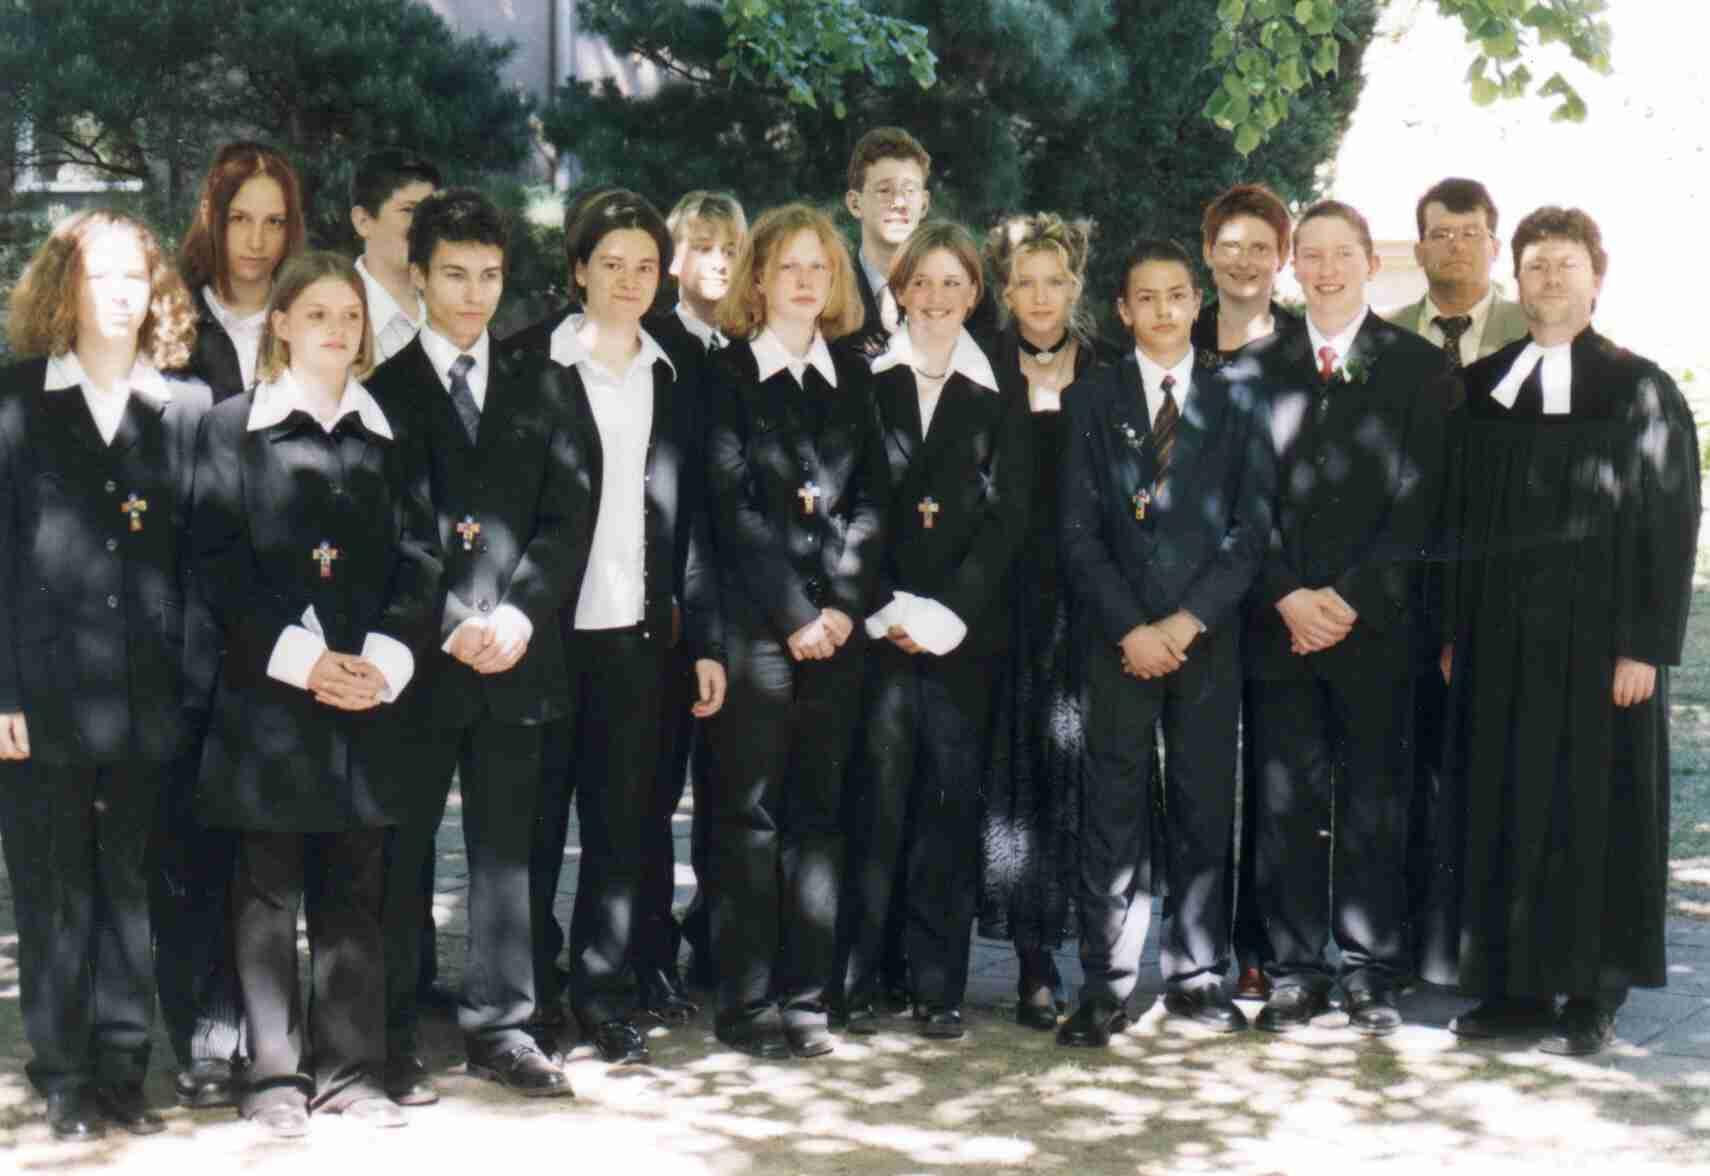 Archiv 2003 egg bayern - Kleidung konfirmation ...